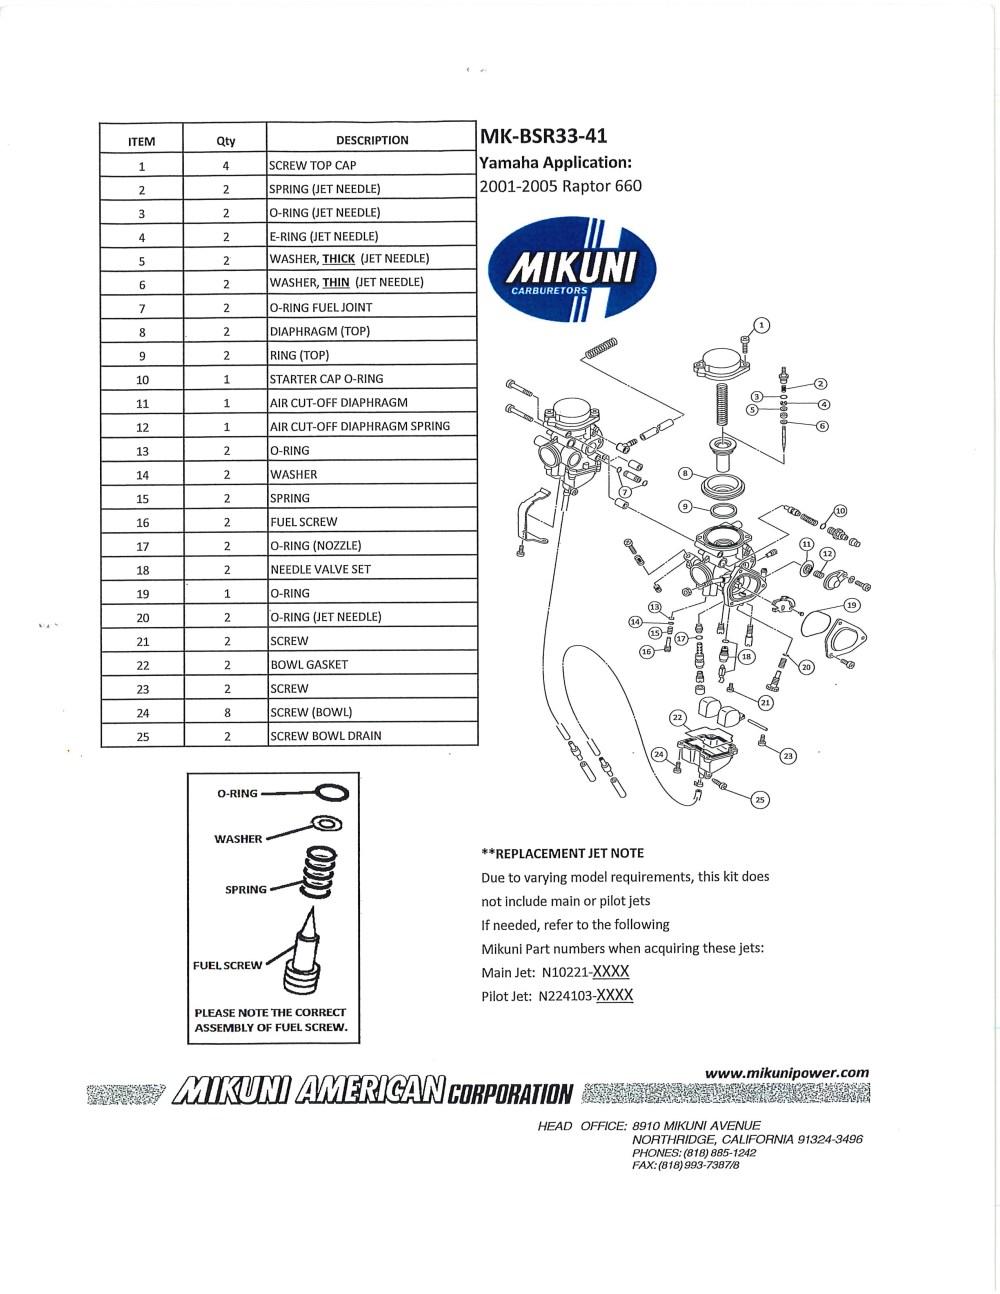 medium resolution of mikuni mk bsr33 41 carburetor rebuild kit exploded view parts list